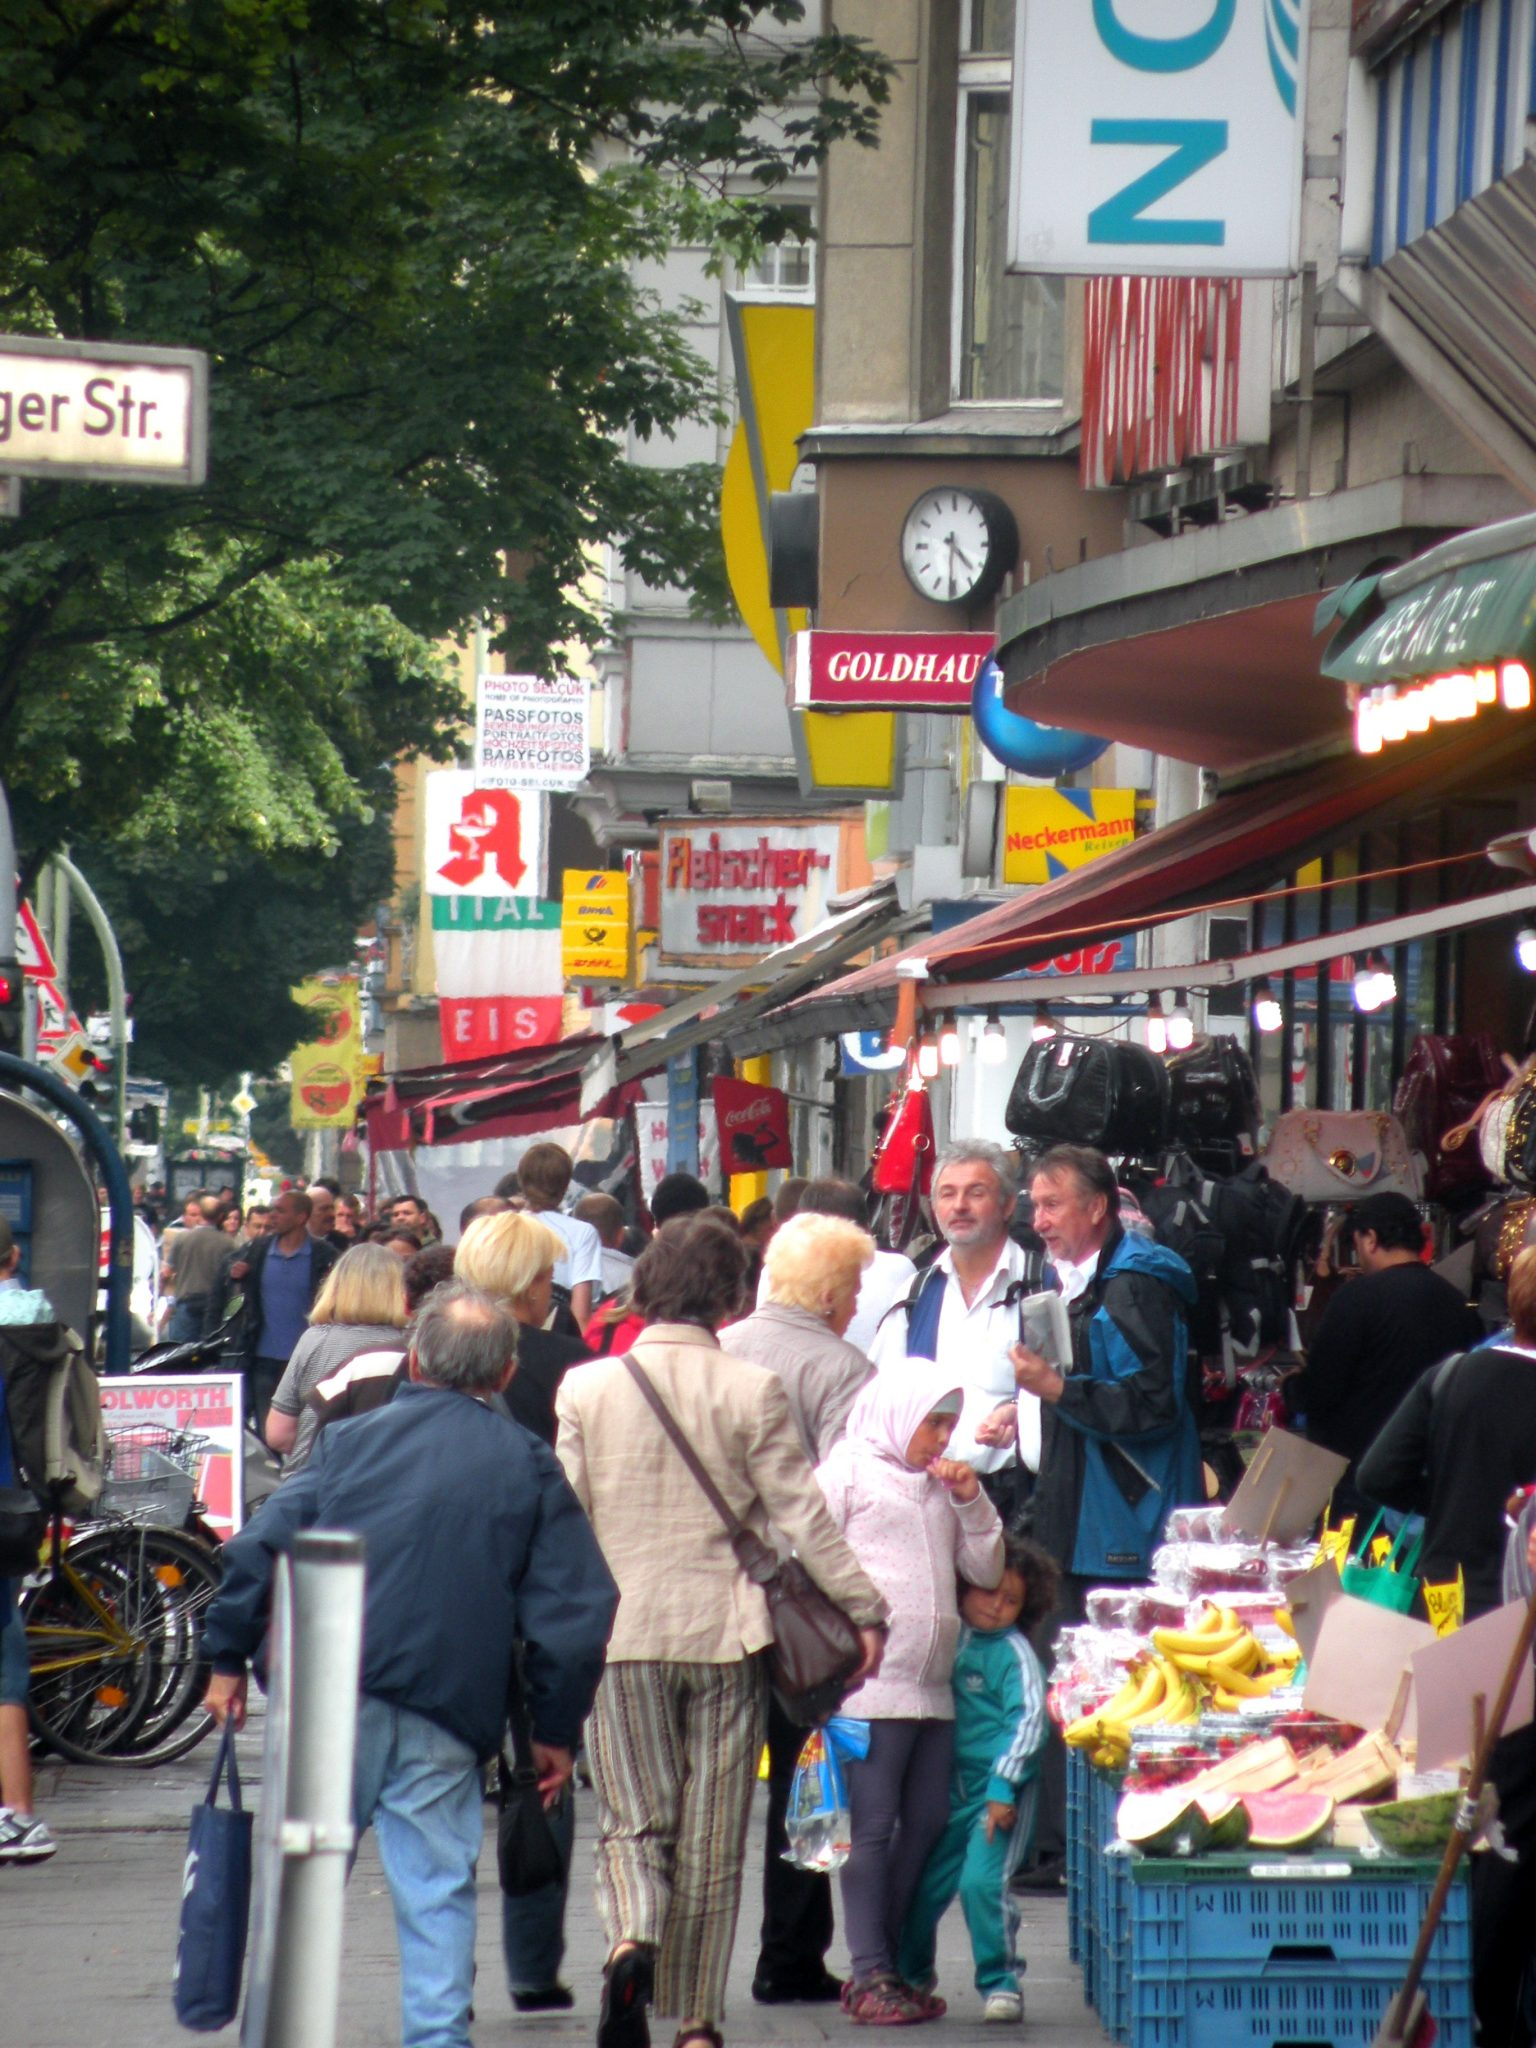 Müllerstraße Ecke Luxemburger Straße